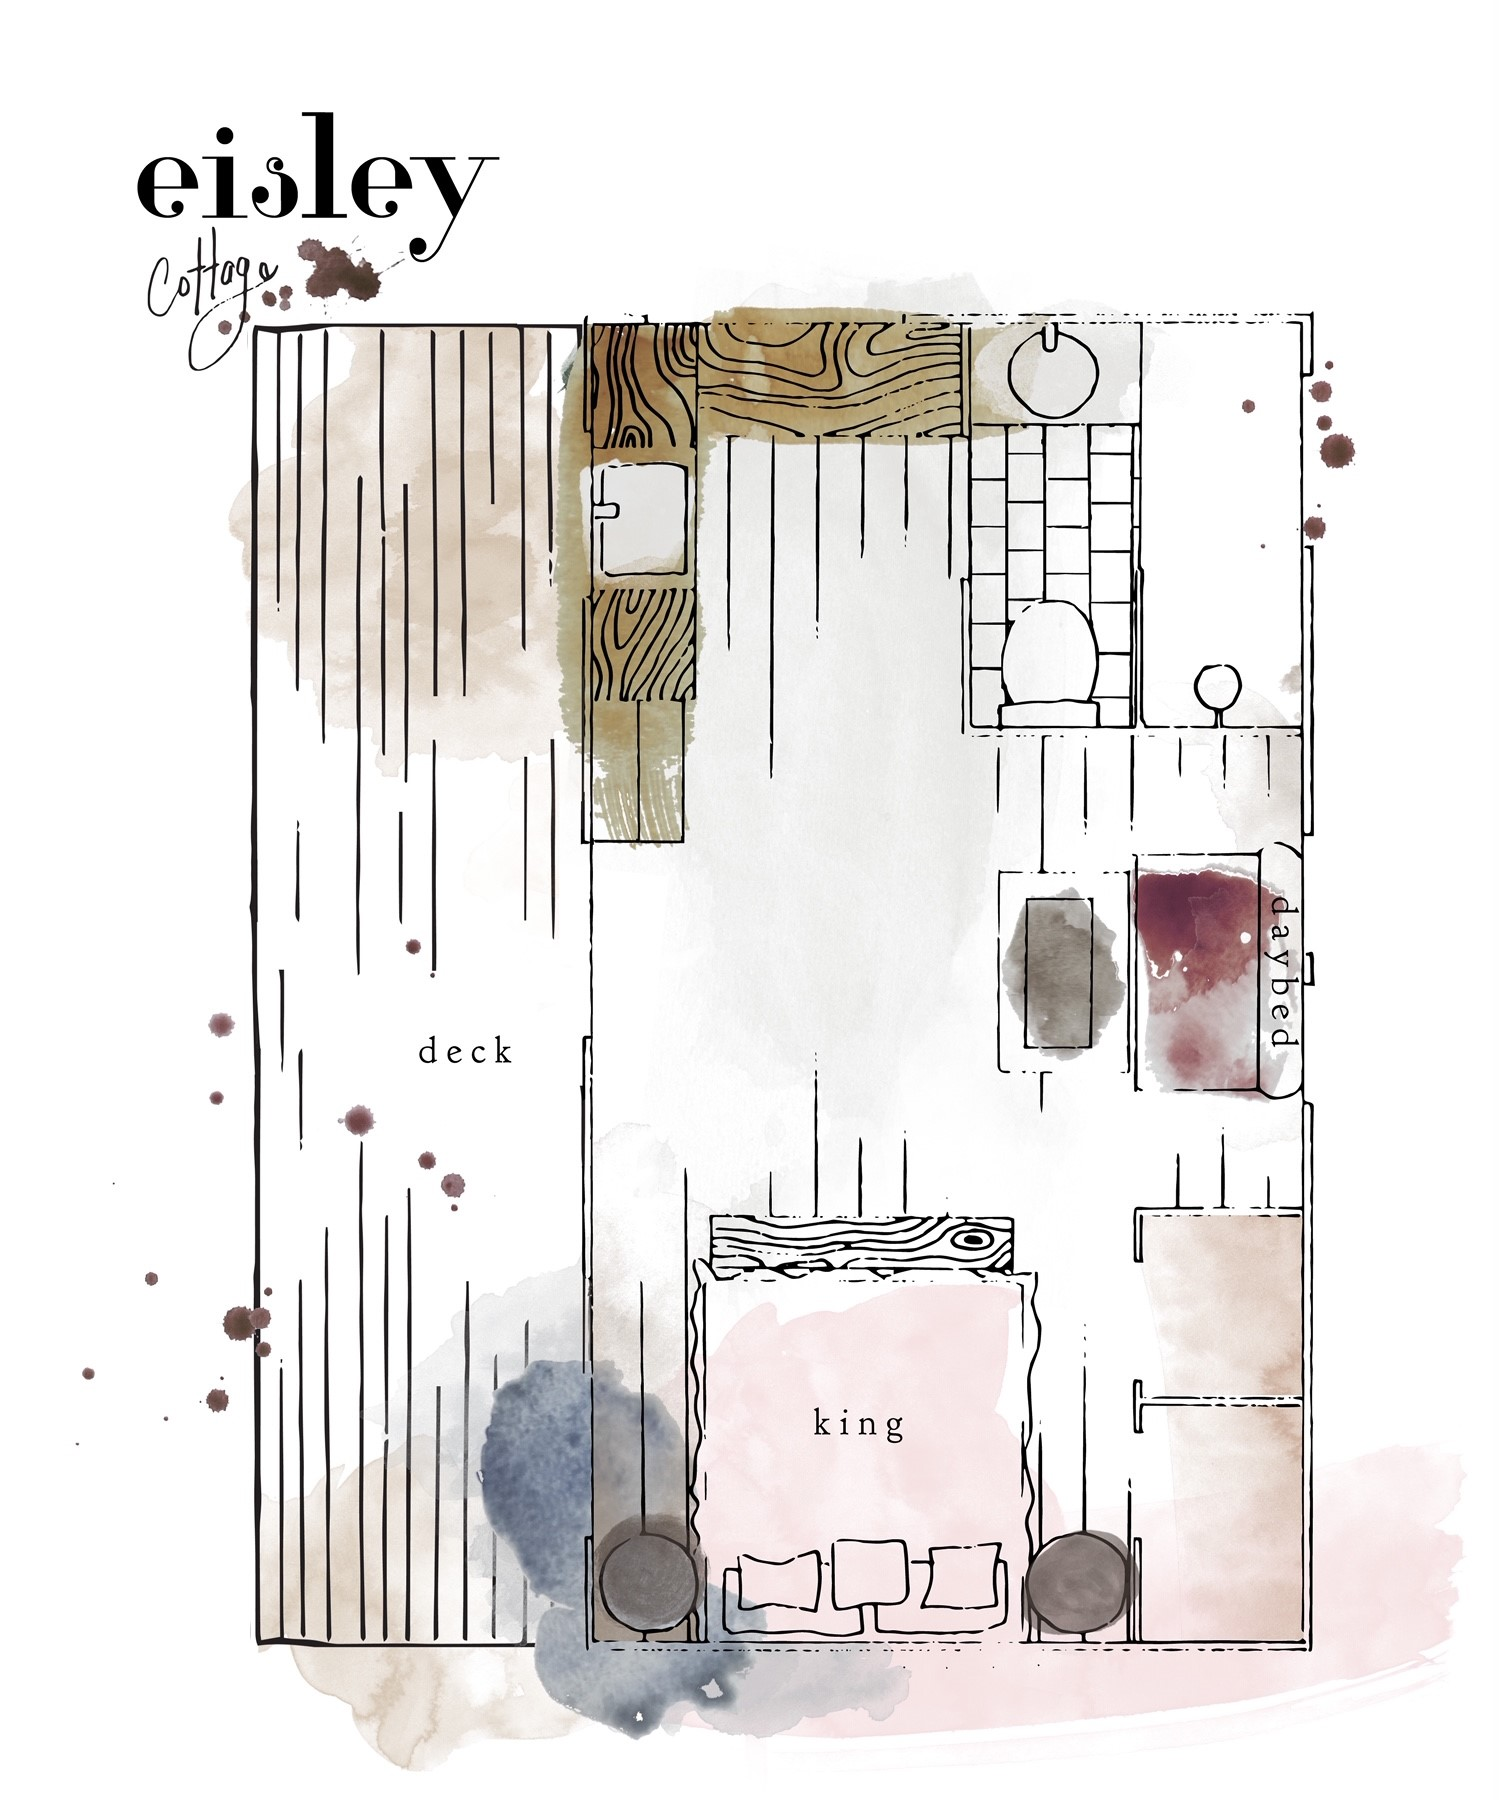 The Eisley LayoutFINAL.jpg